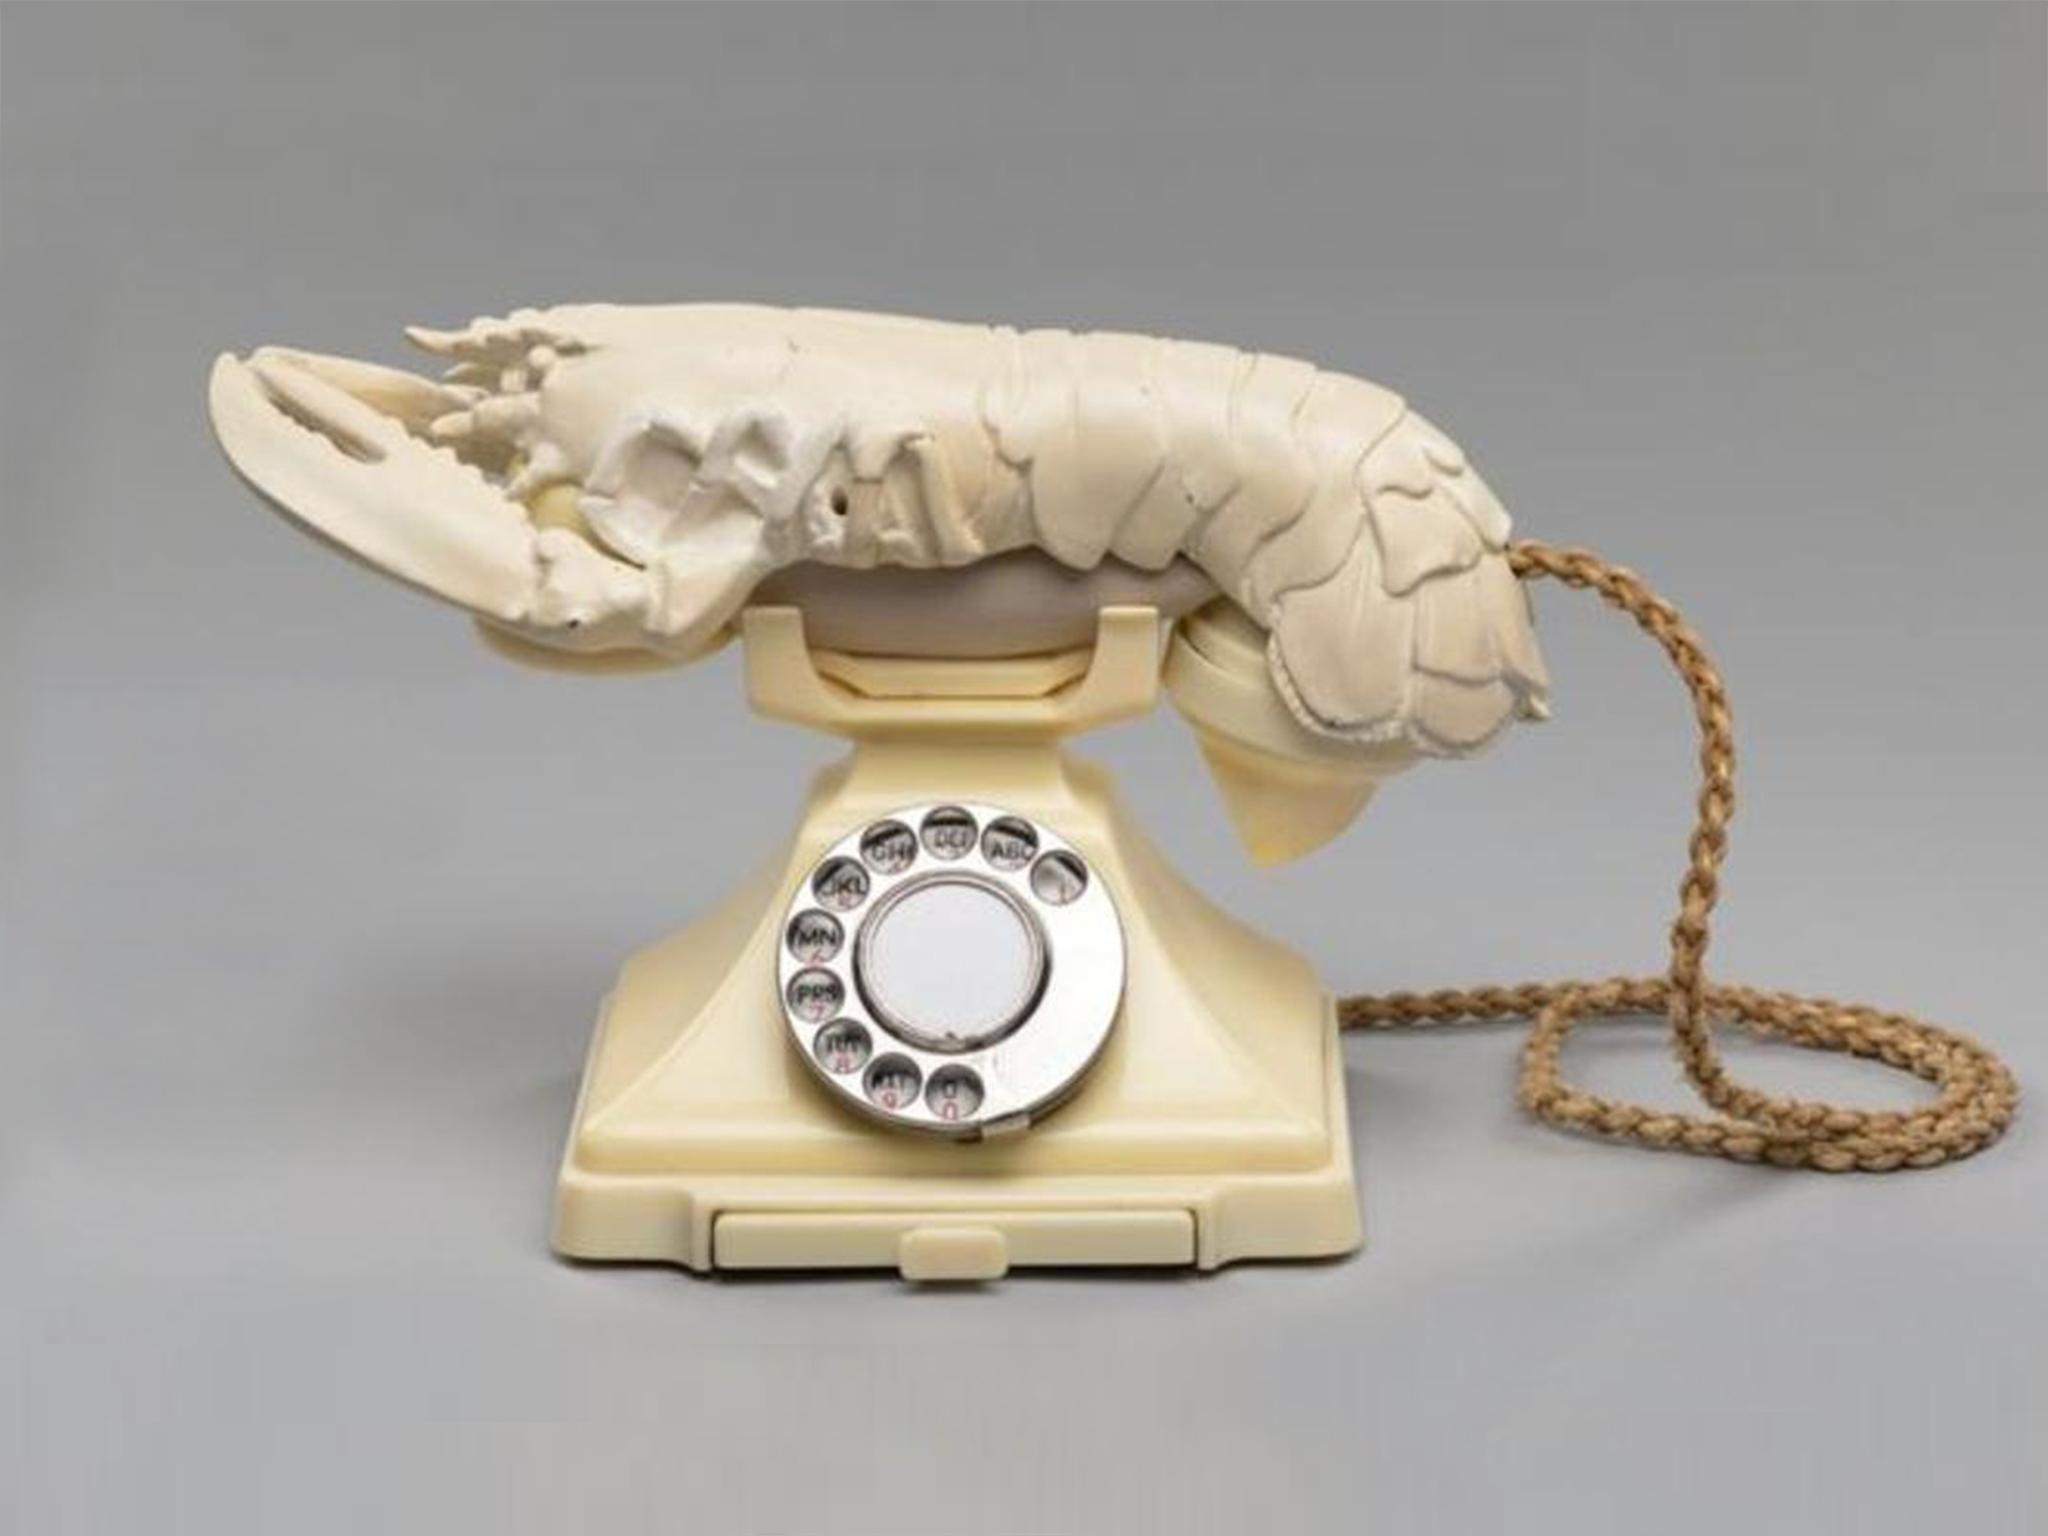 Telefone Afrodisiaco Branco